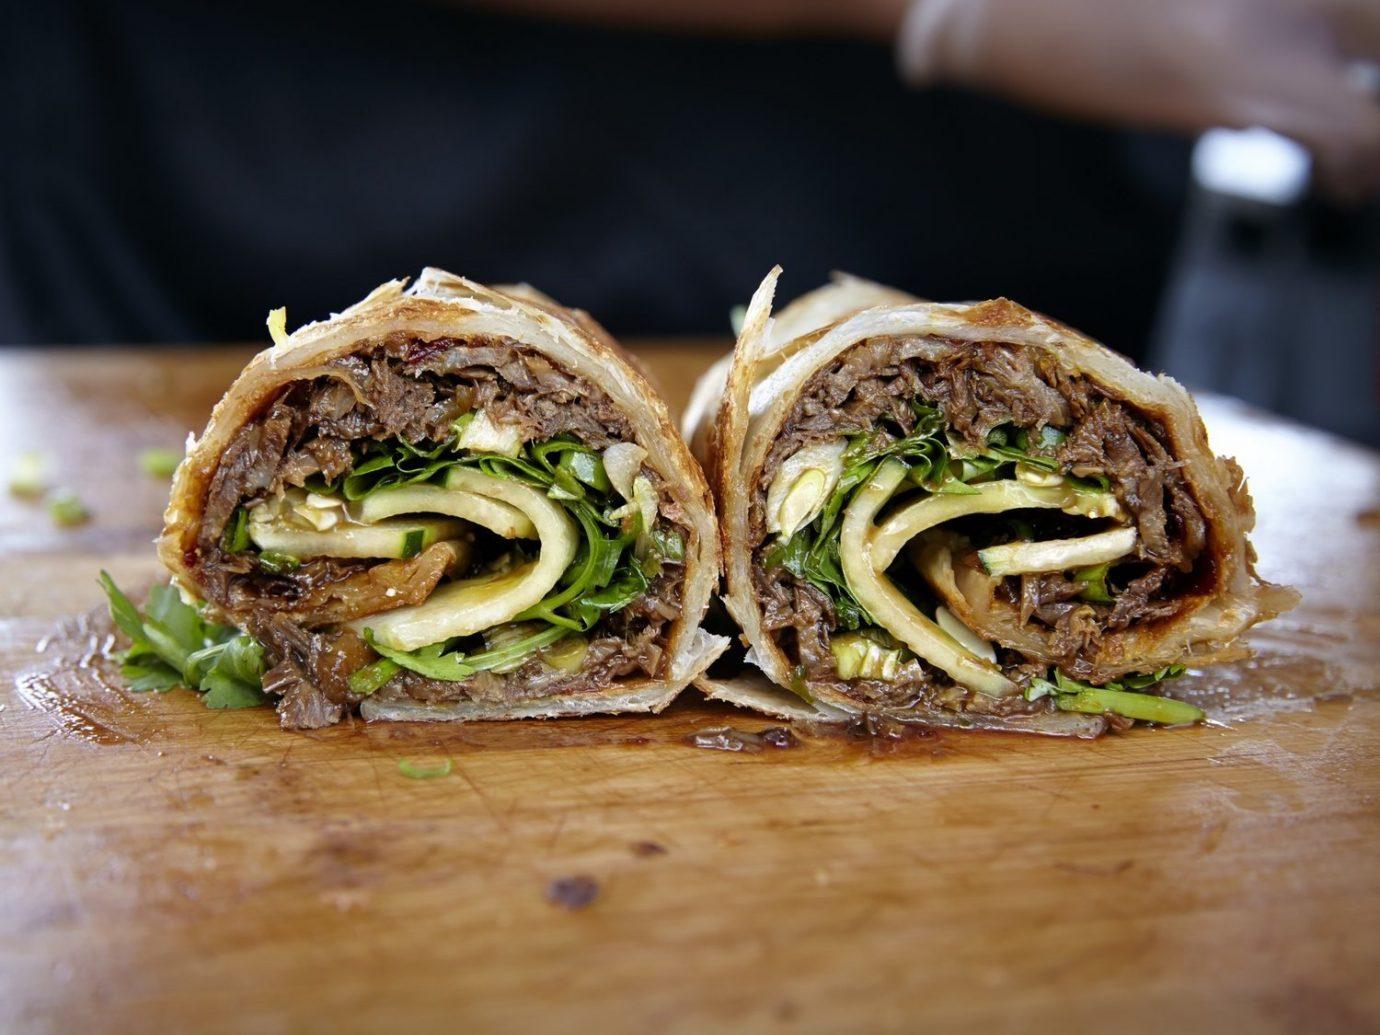 Budget Trip Ideas food dish sandwich produce cuisine vegetable half close meat